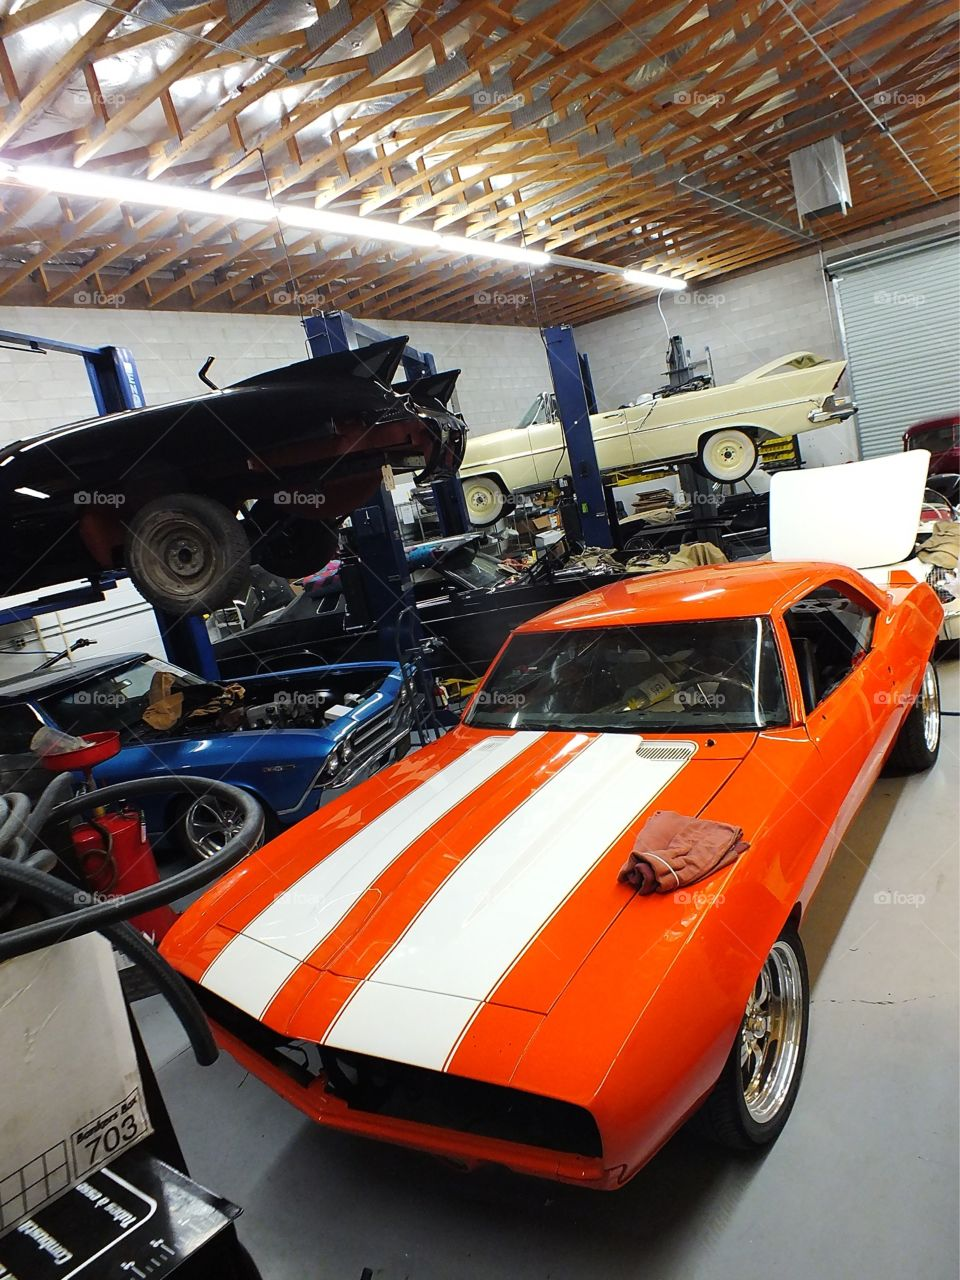 Classic car restoration shop in Las Vegas